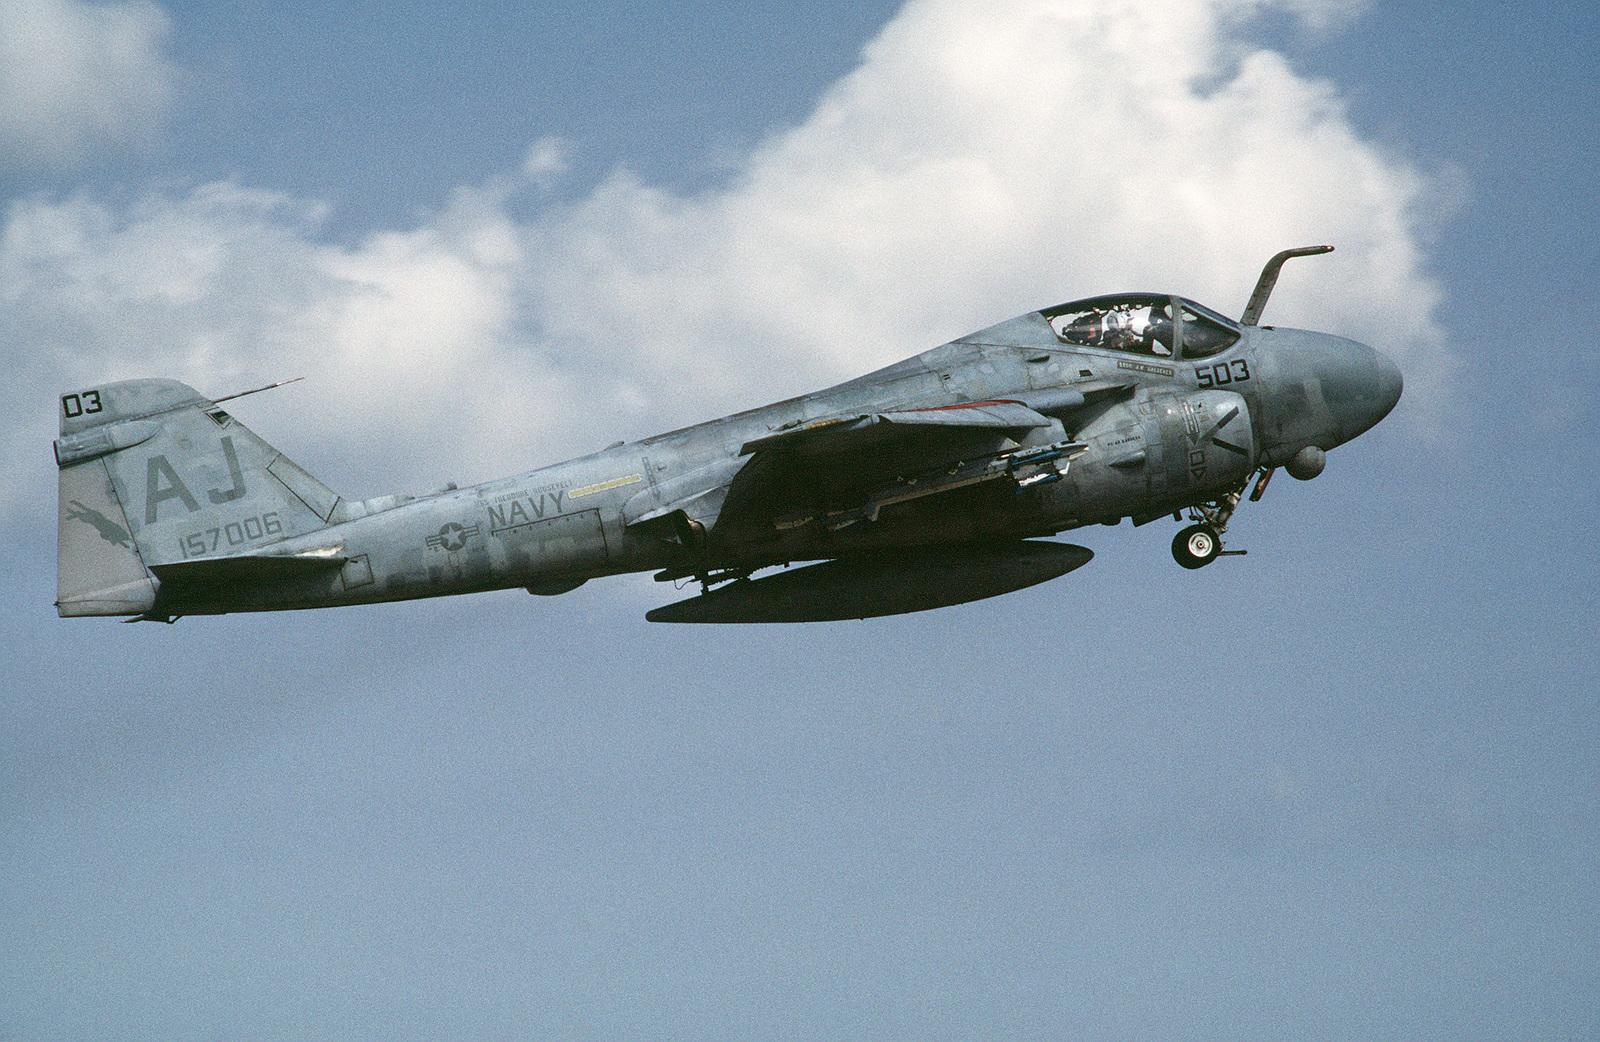 An Attack Squadron 35 (VA-35) A-6E Intruder aircraft takes off